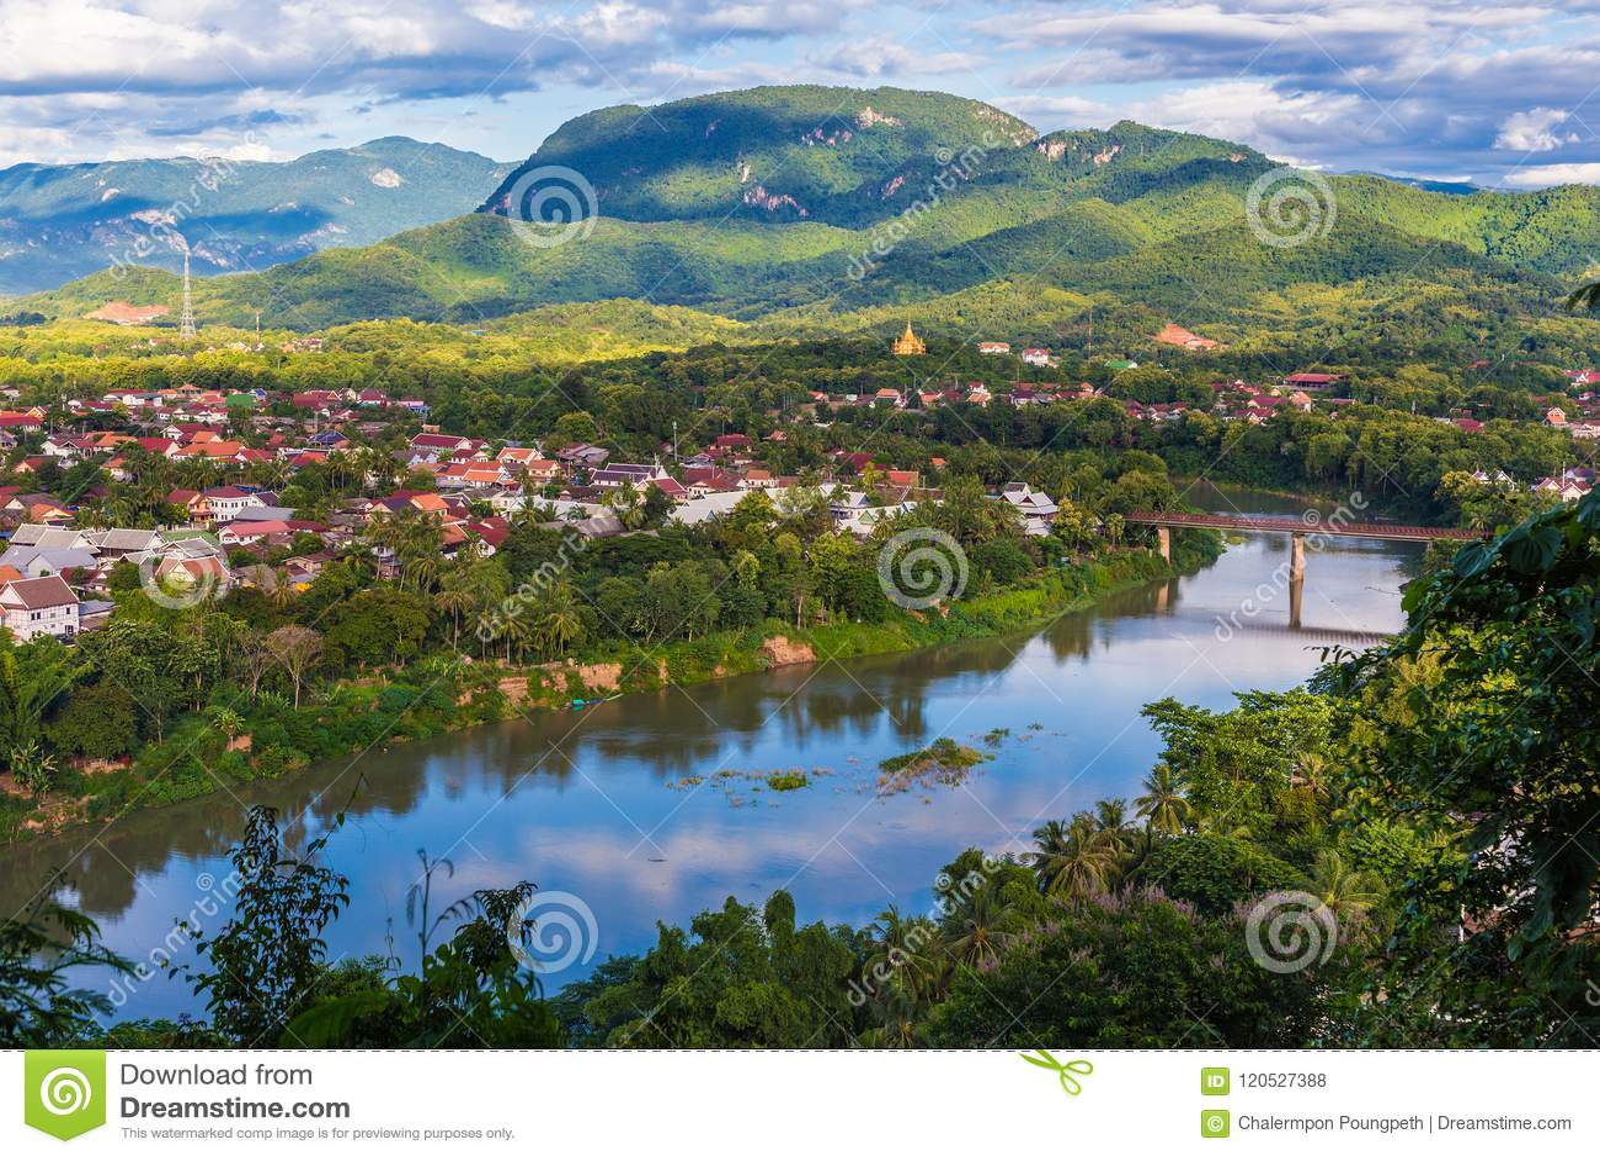 Mening van Luang Prabang en Nam Khan-rivier in Laos met mooi